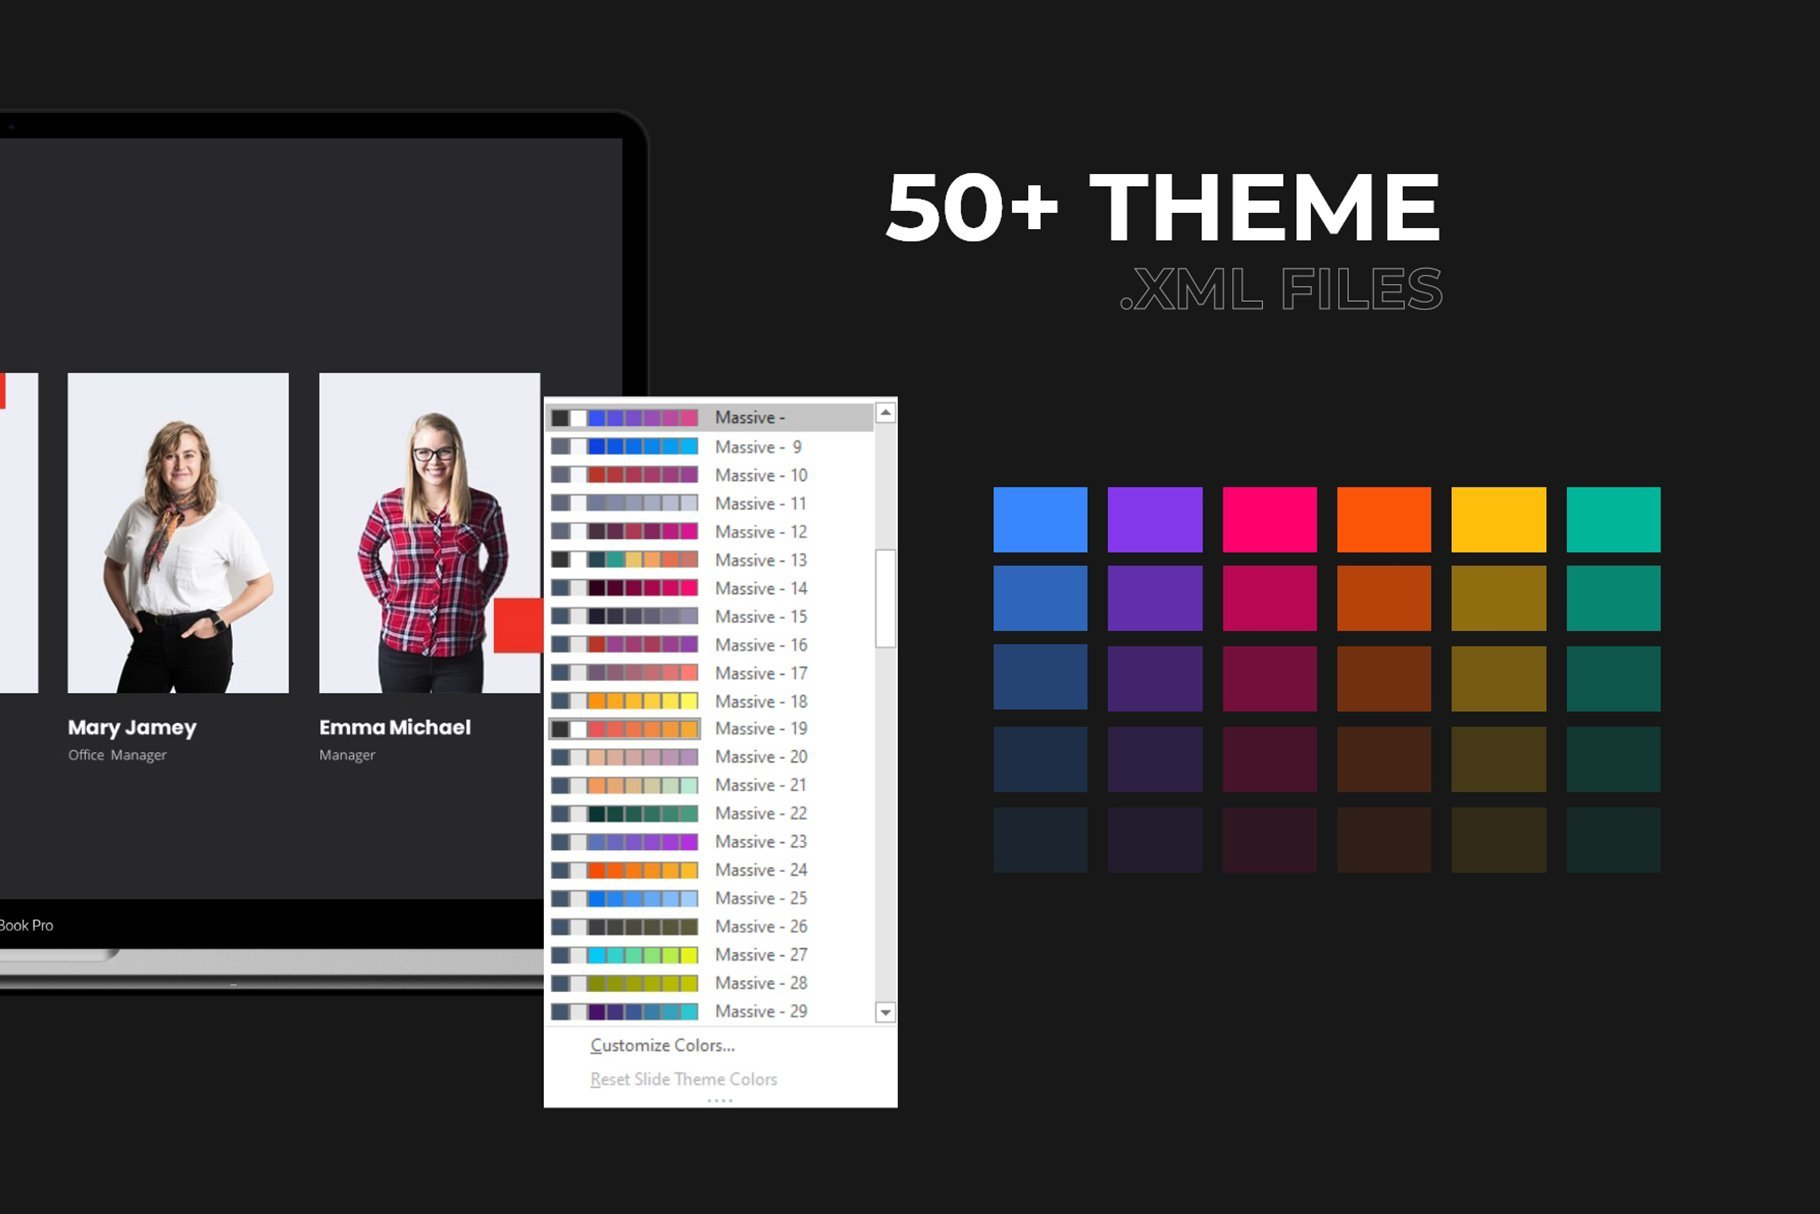 Color theme of presentation.